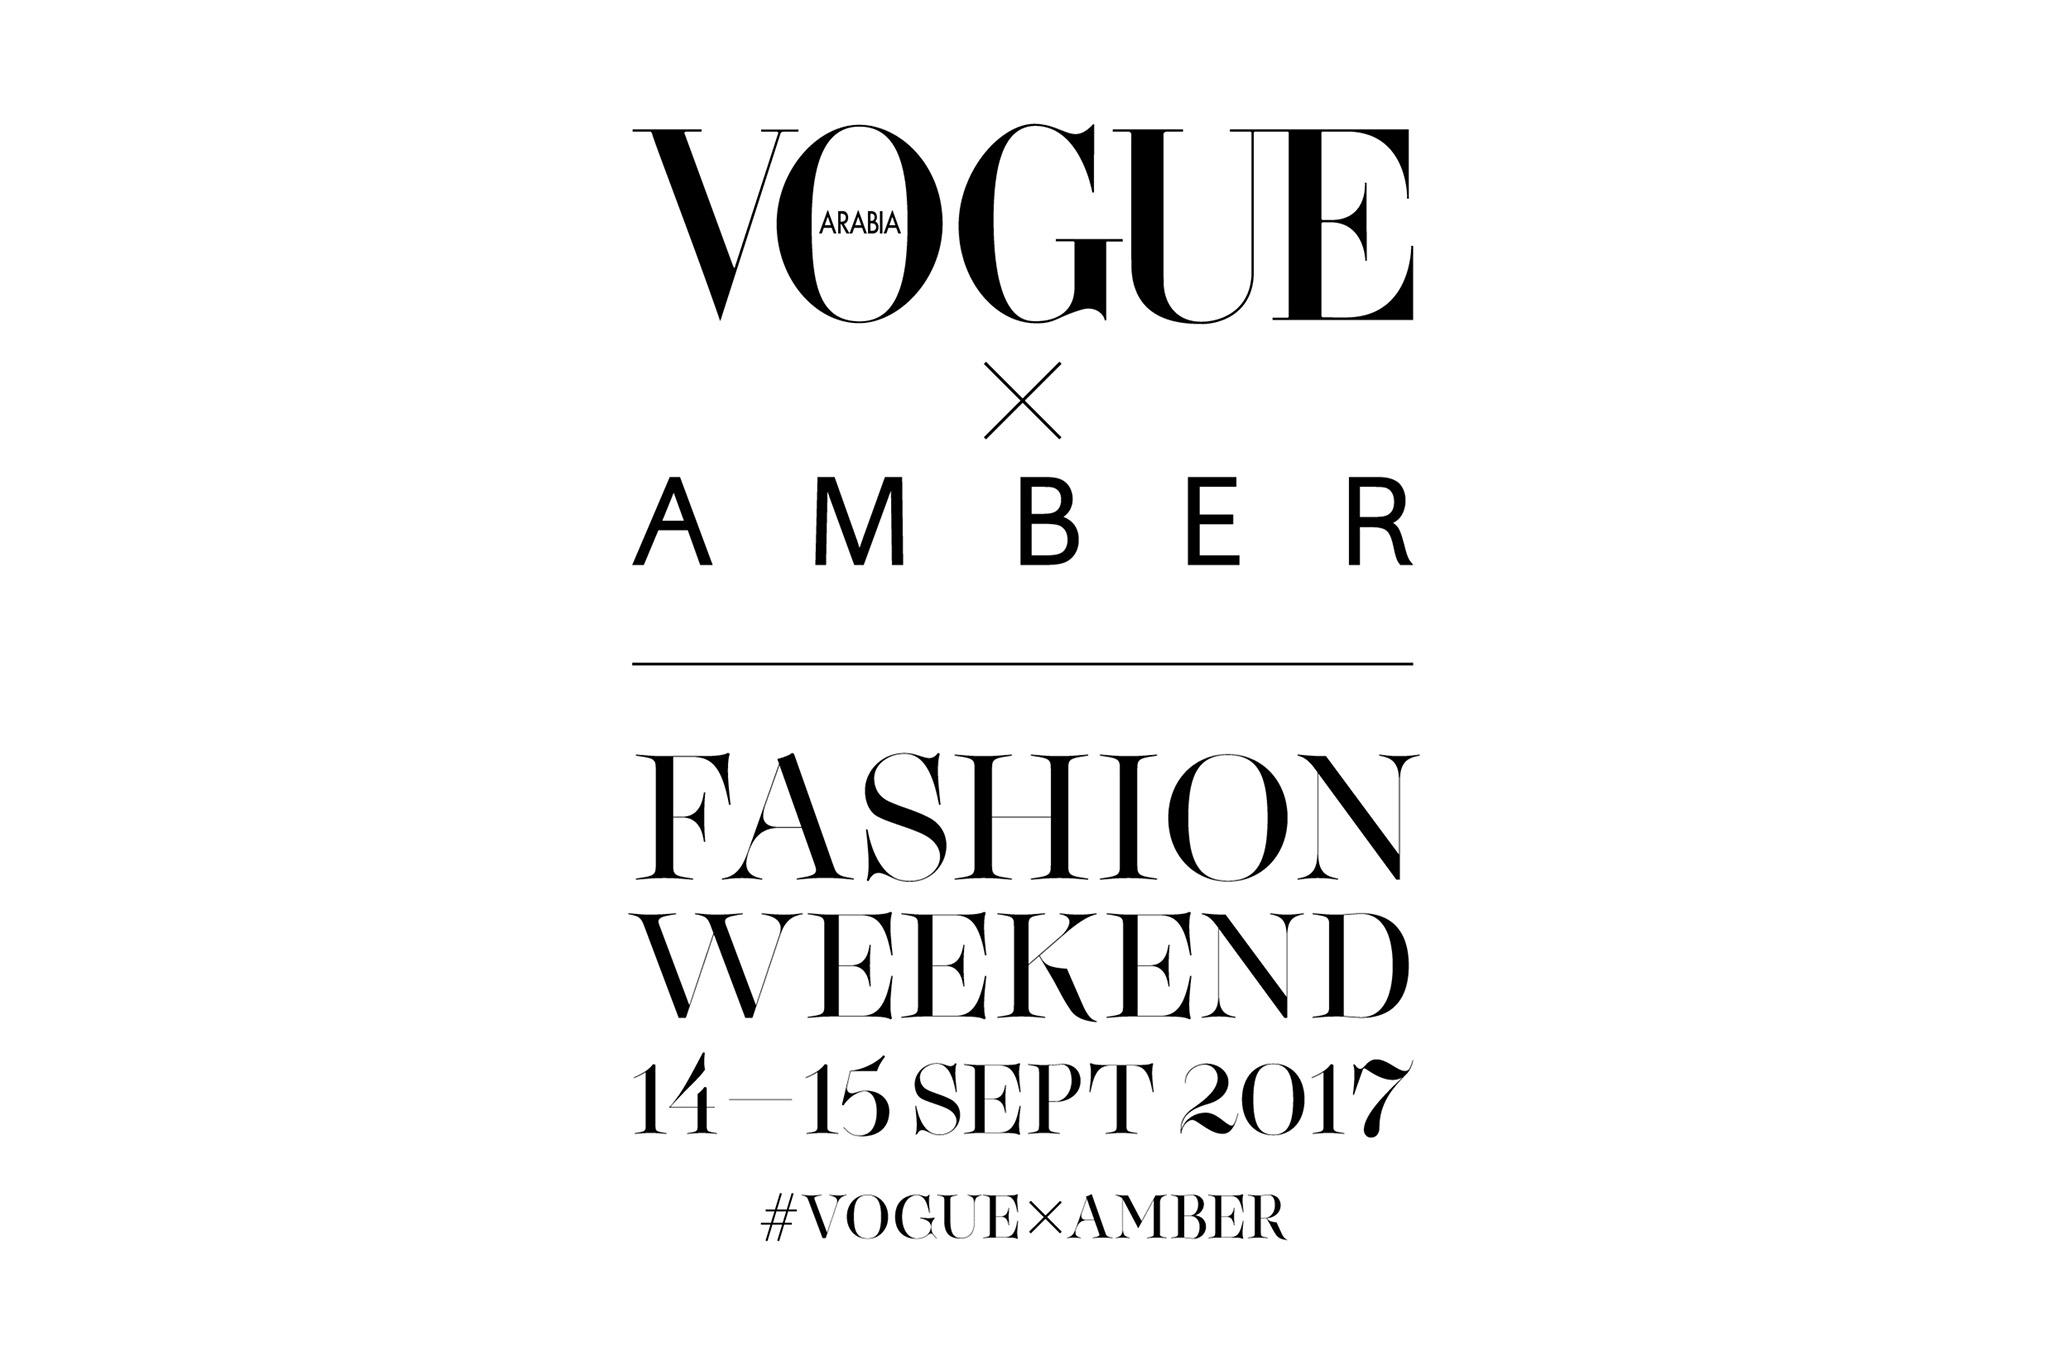 Vogue Amber